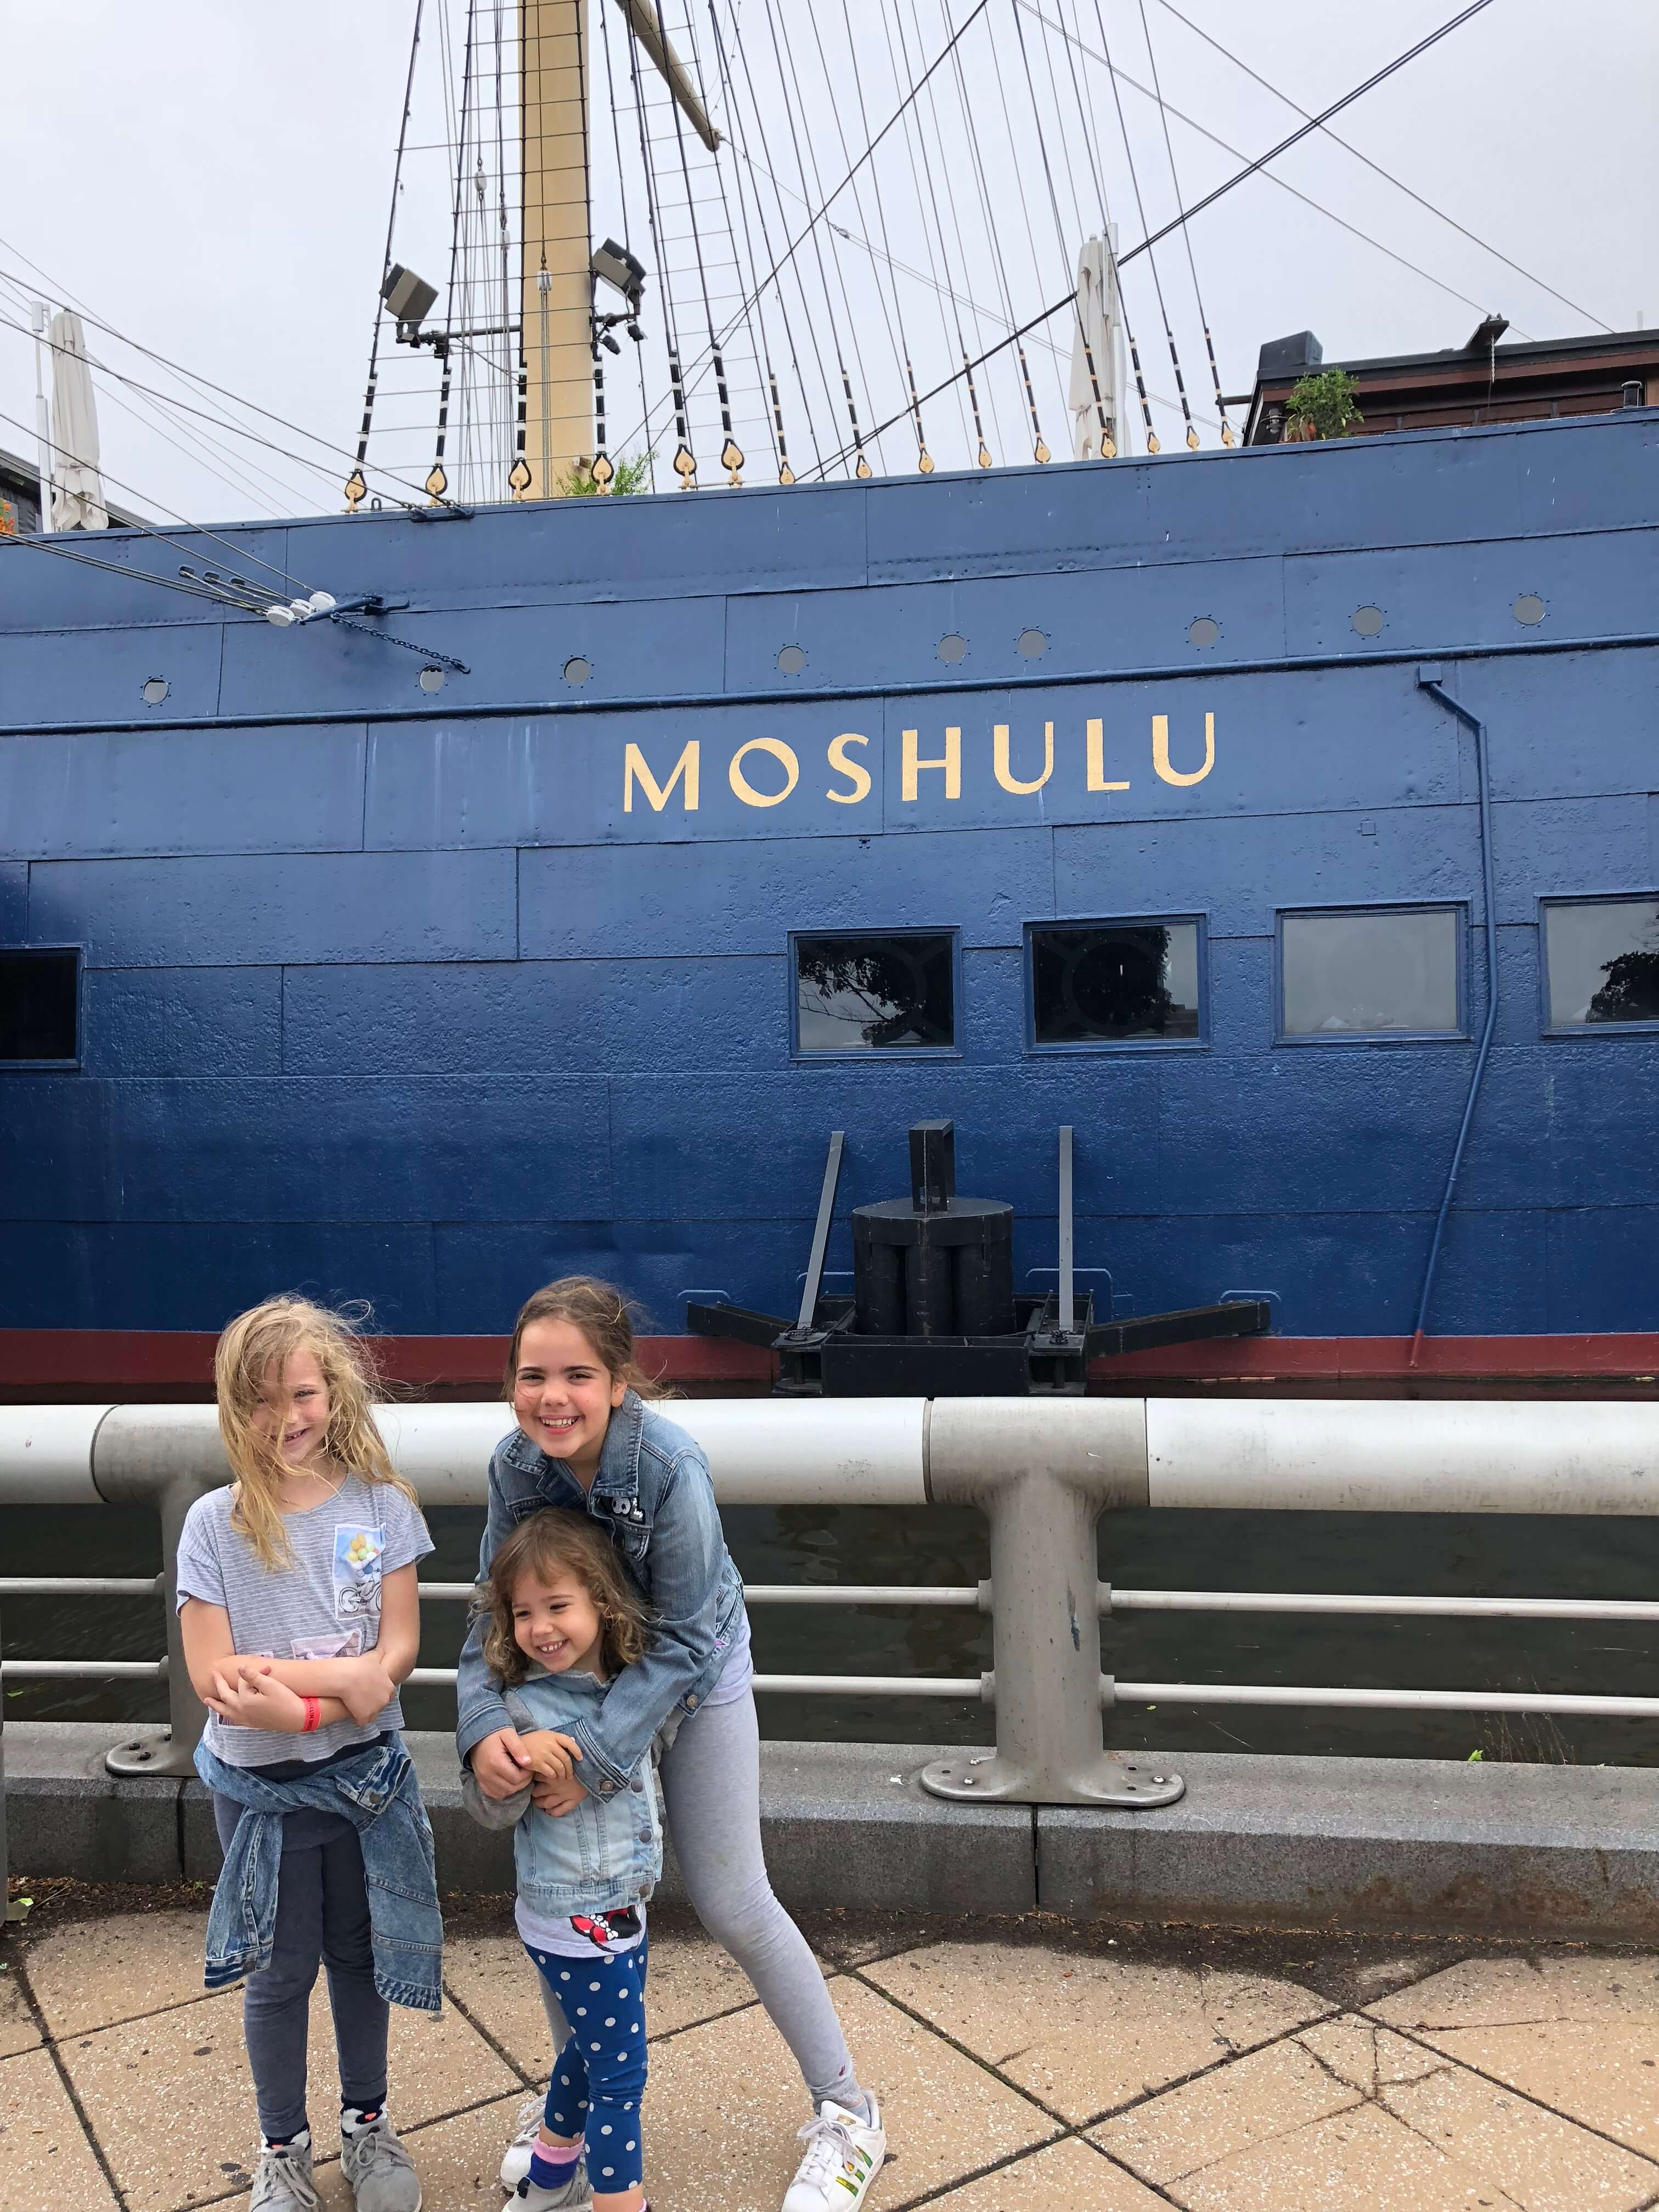 Moshulu Restaurant